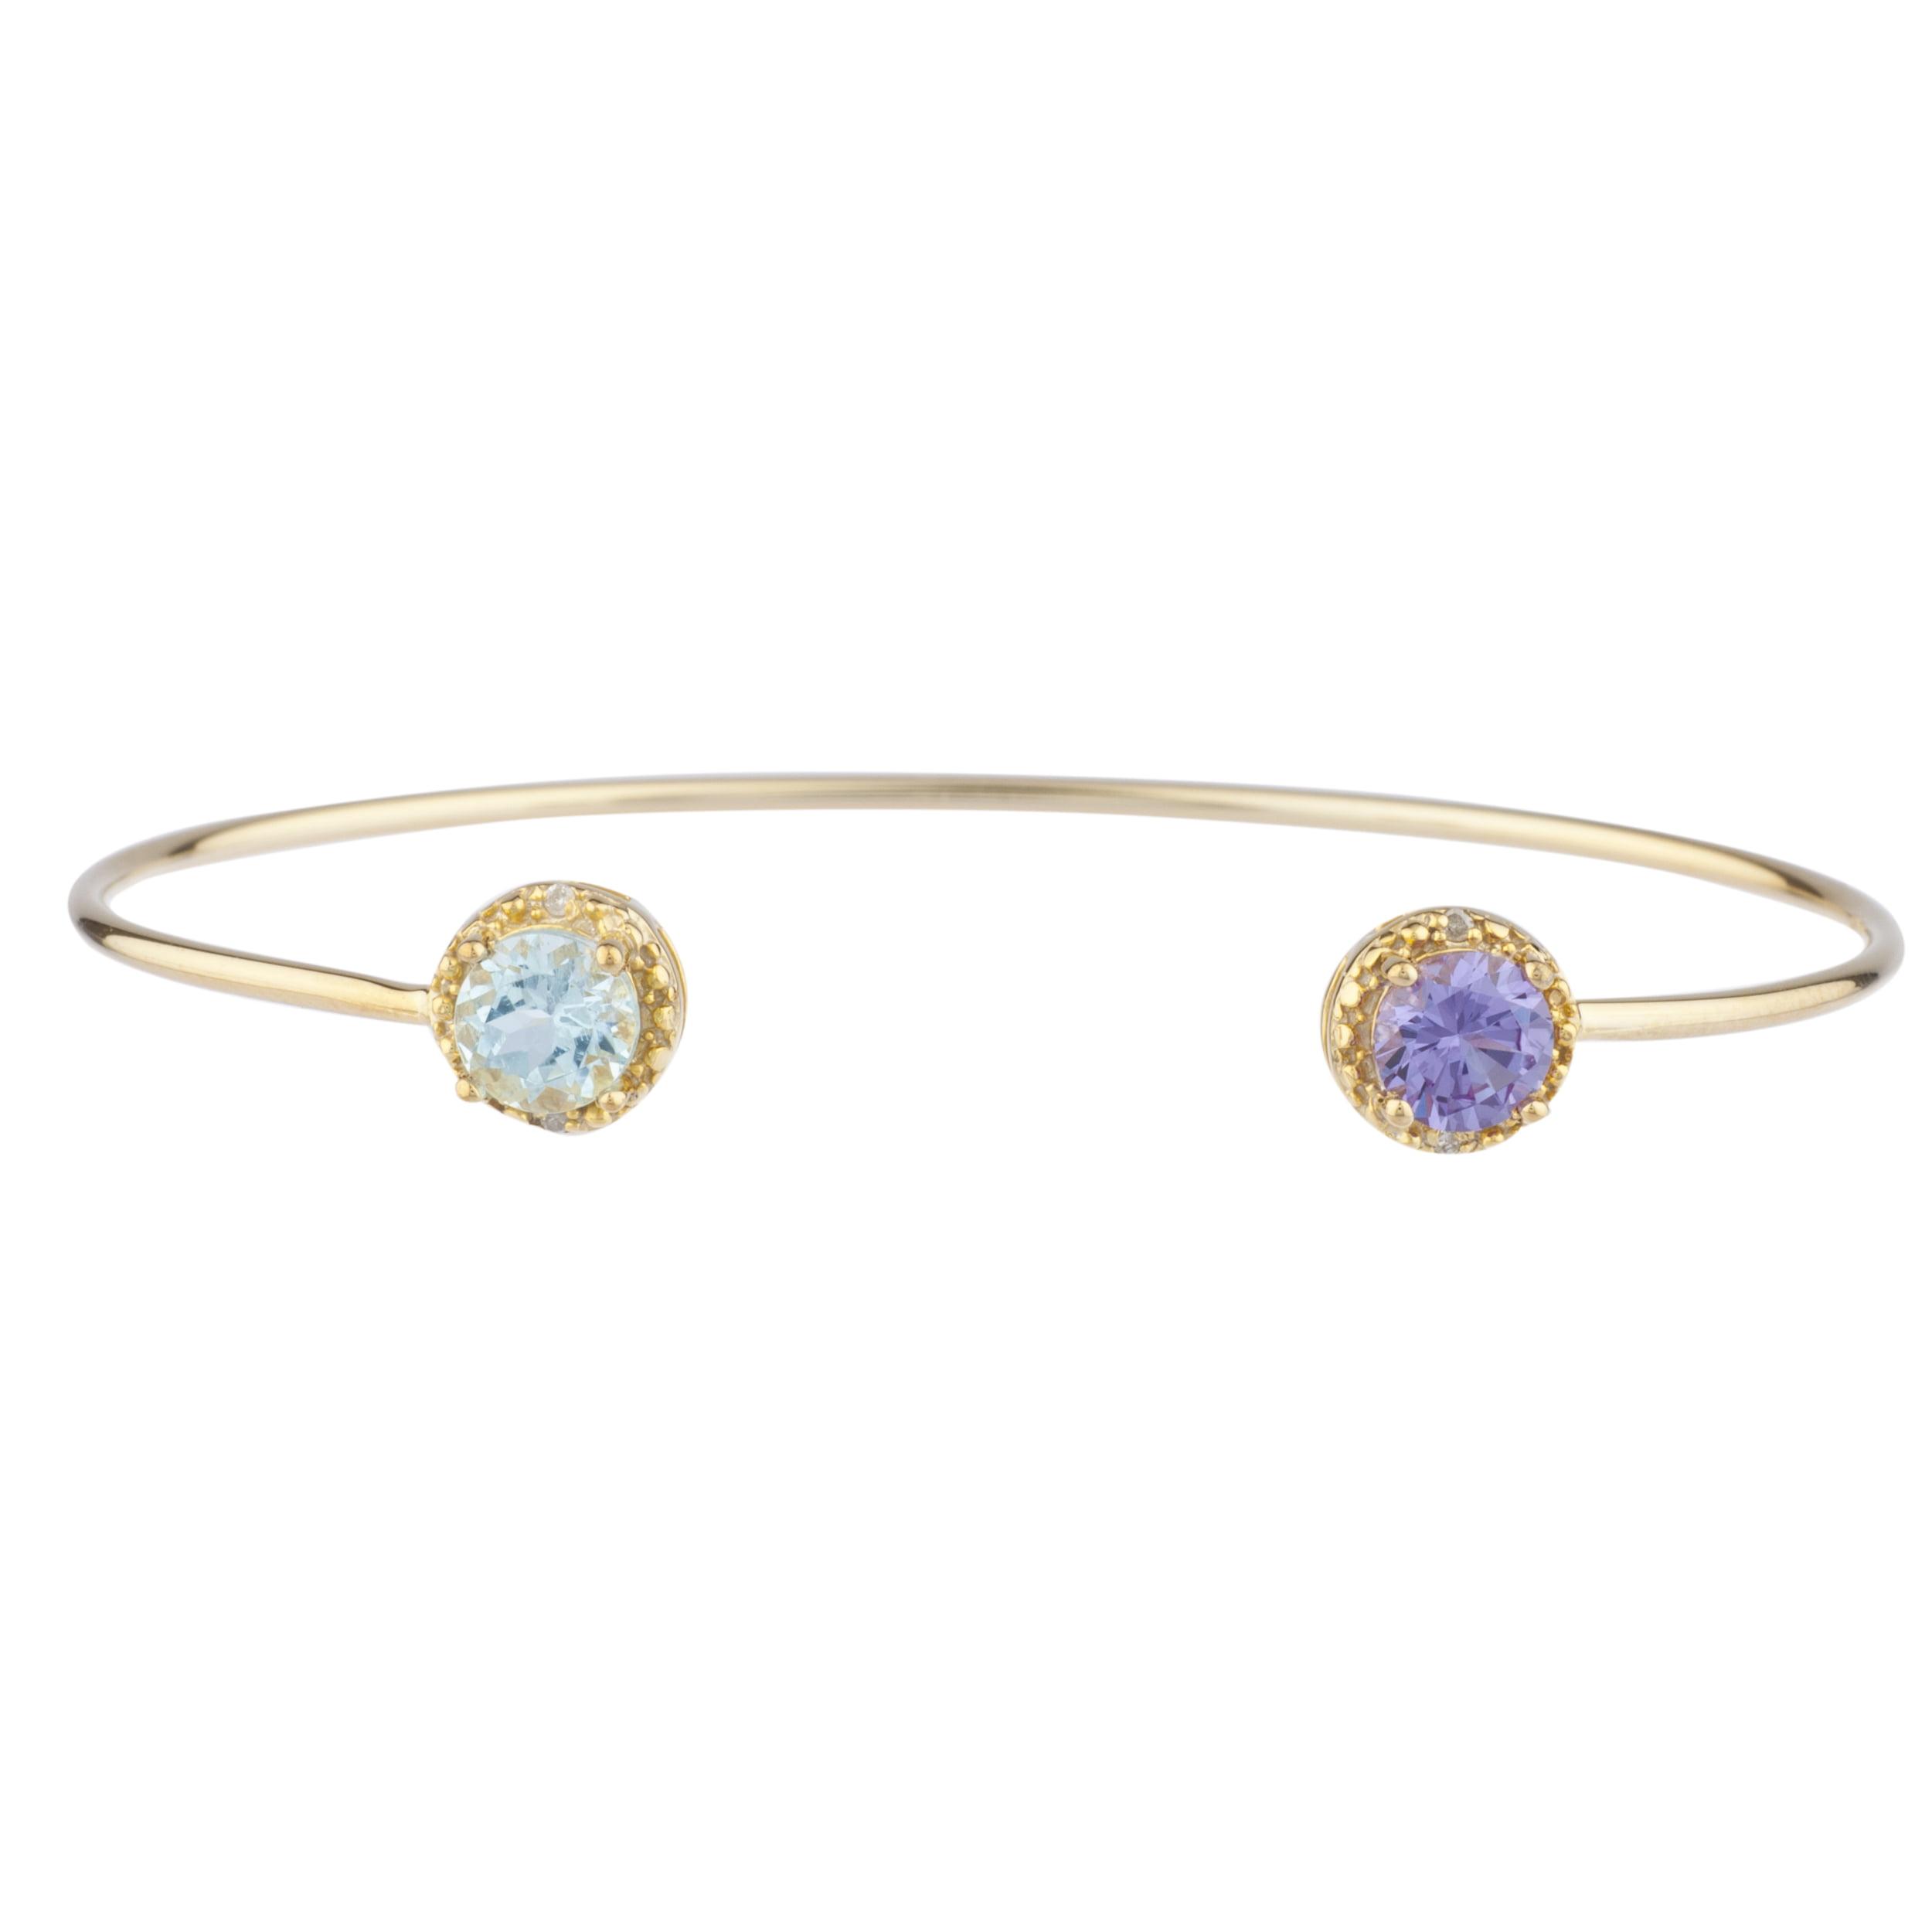 Genuine Aquamarine & Alexandrite Diamond Bangle Bracelet 14Kt Yellow Gold Plated Over .925 Sterling Silver by Elizabeth Jewelry Inc